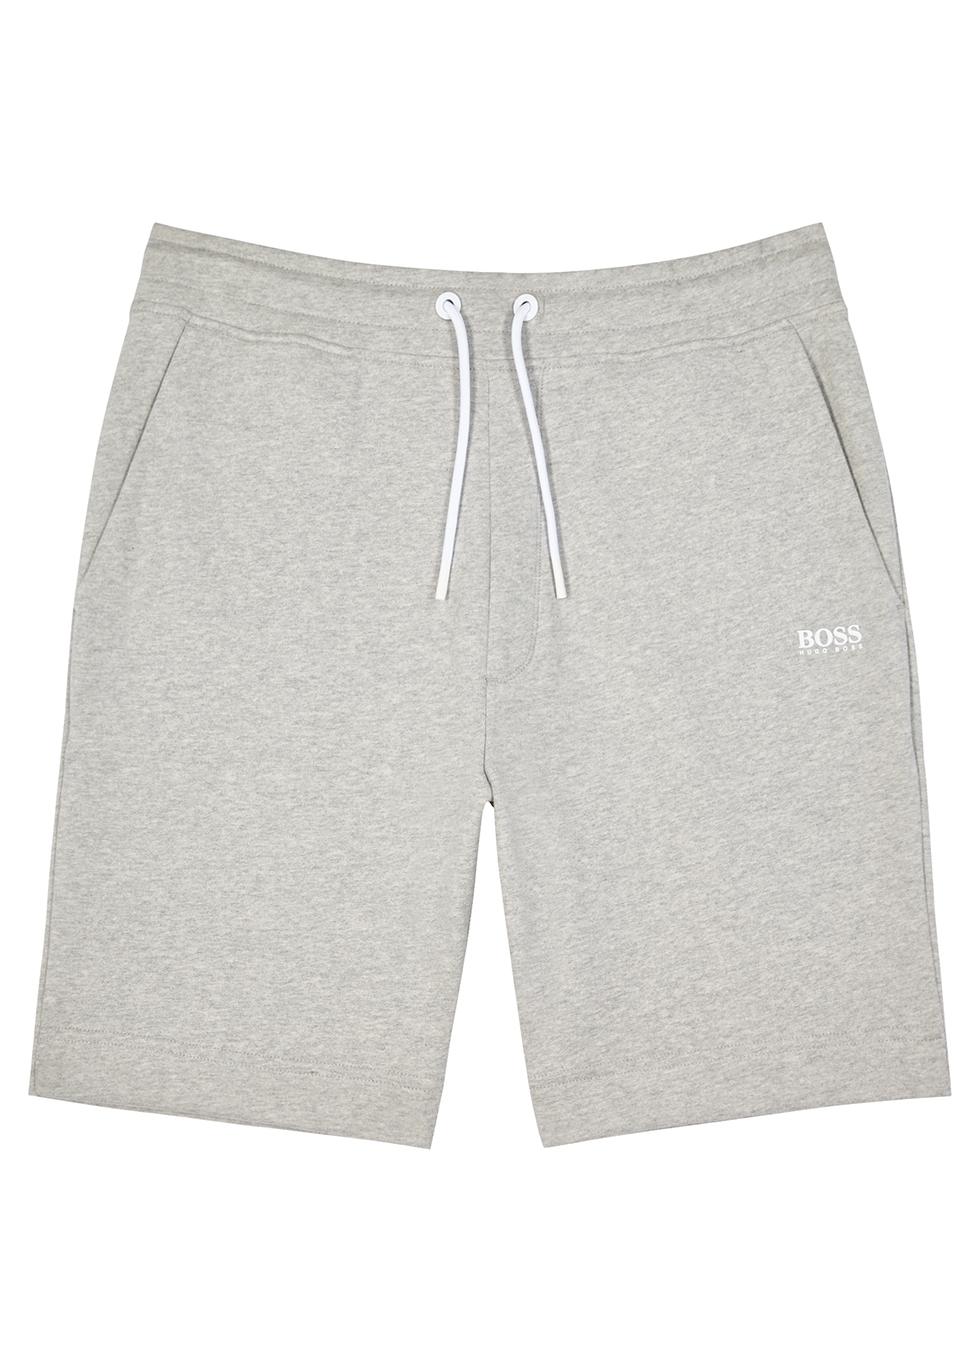 Skeevito grey jersey shorts